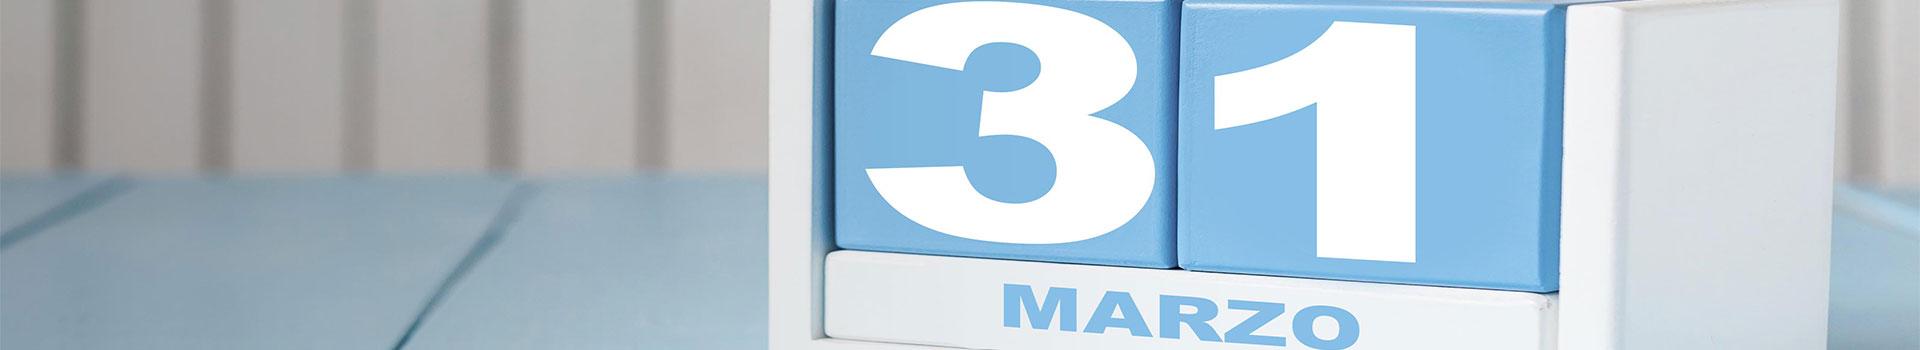 PP-31-Marzo